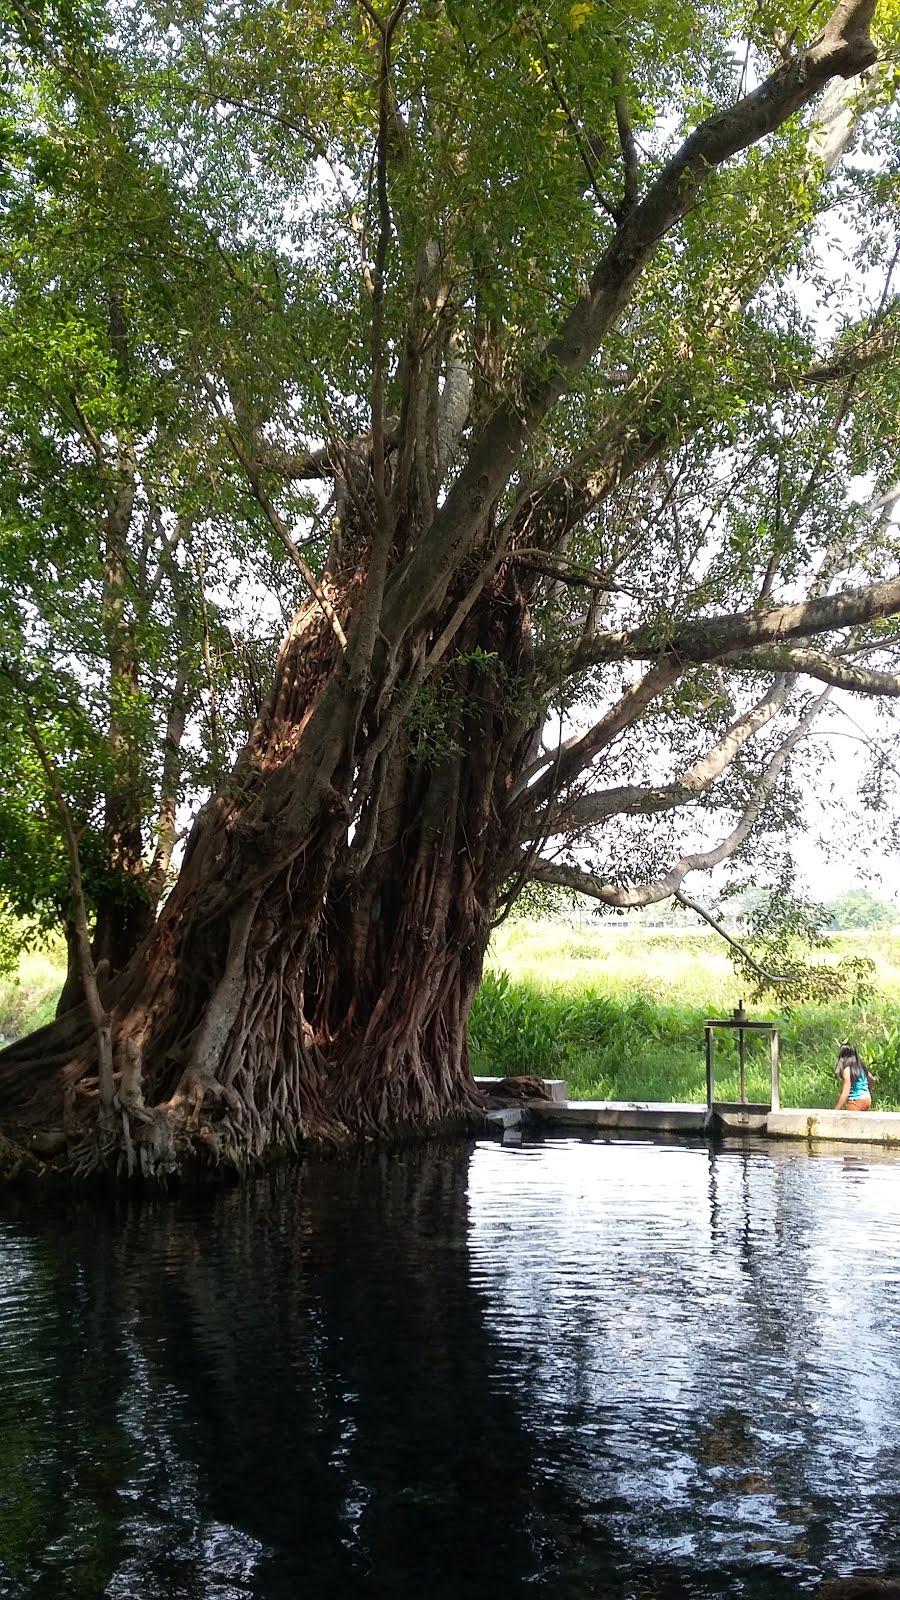 Umbul Manten Menikmati Kesegaran Mata Air Jernih Jawa Tengah Kab